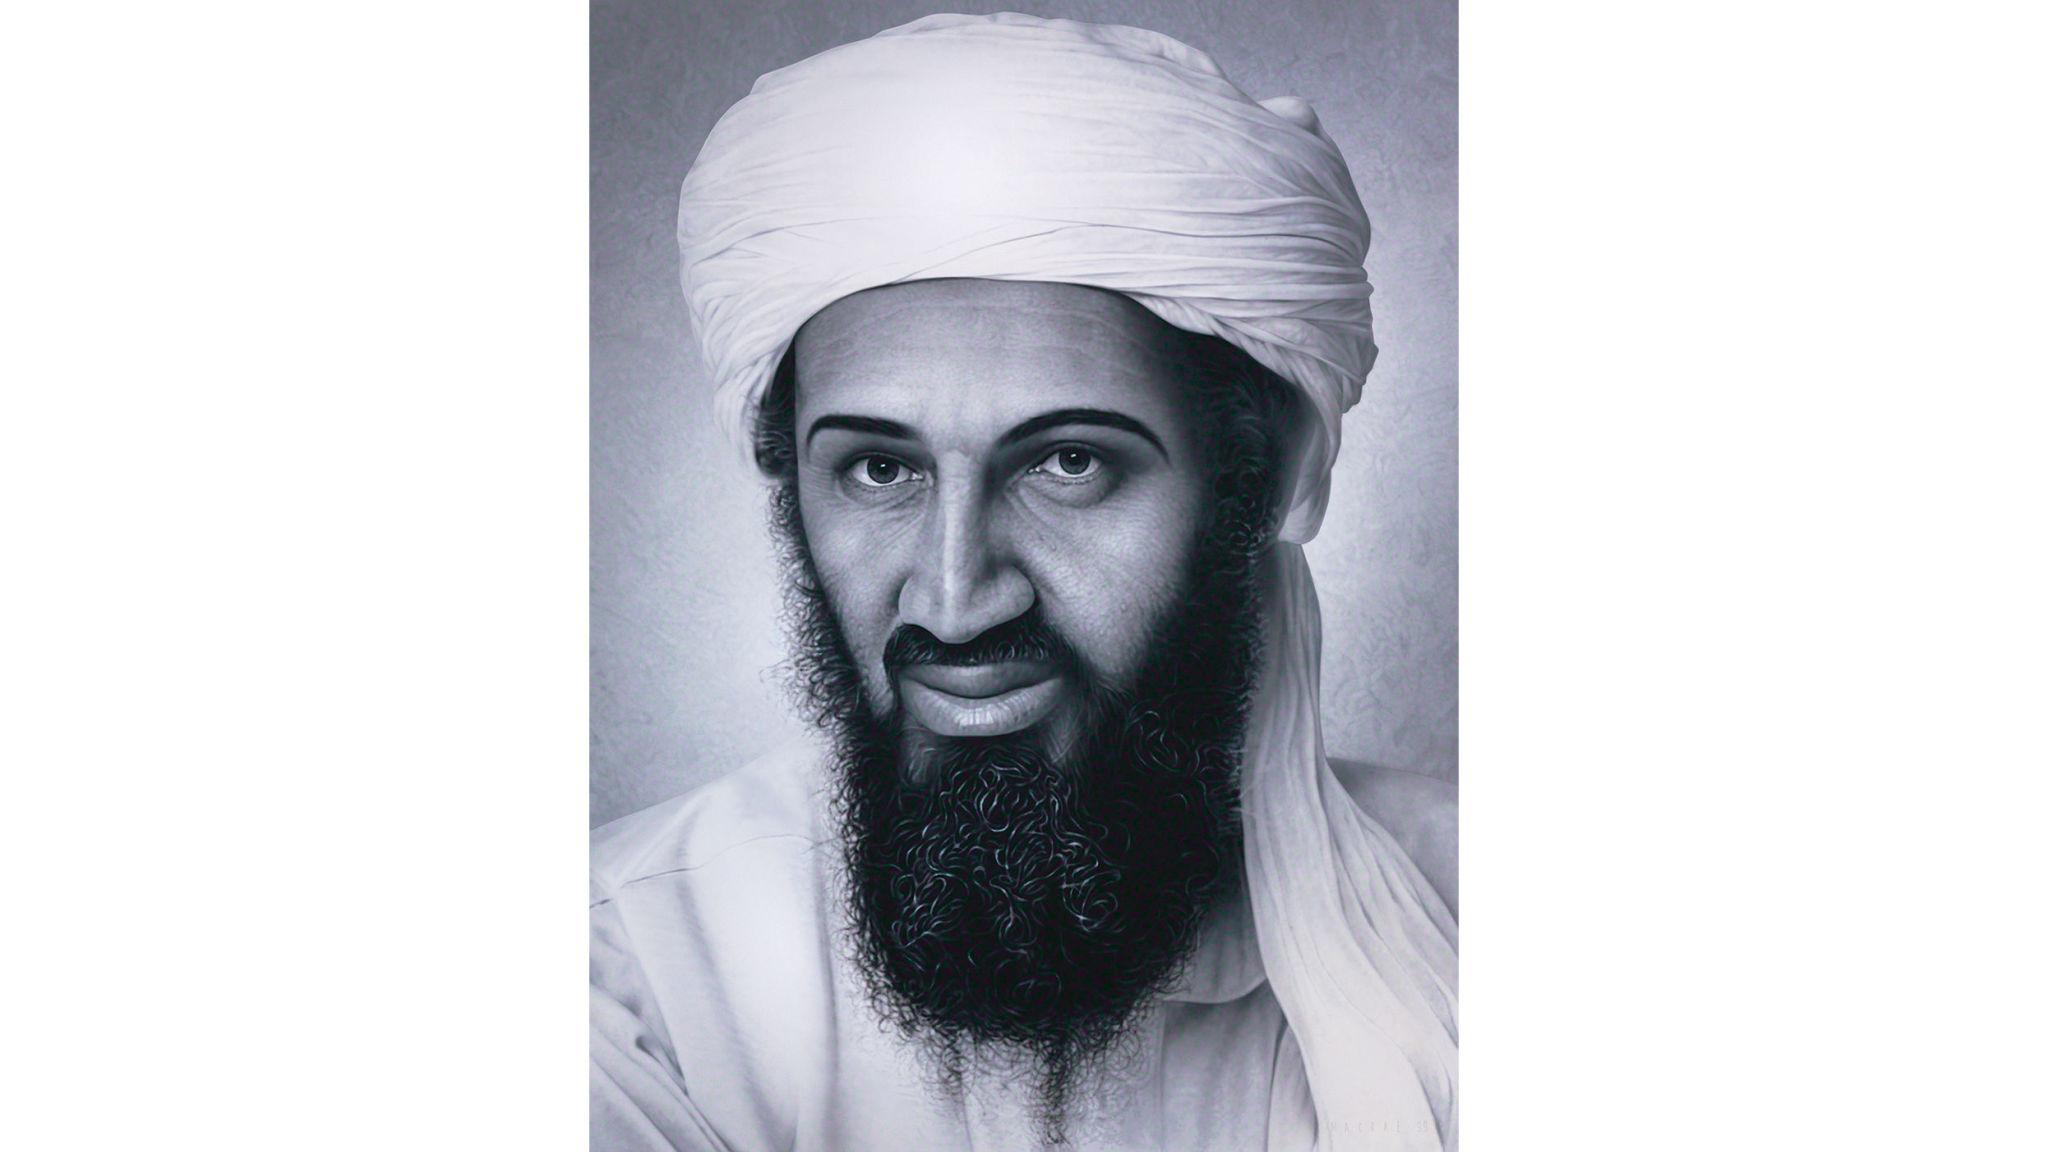 osama bin laden haqqinda